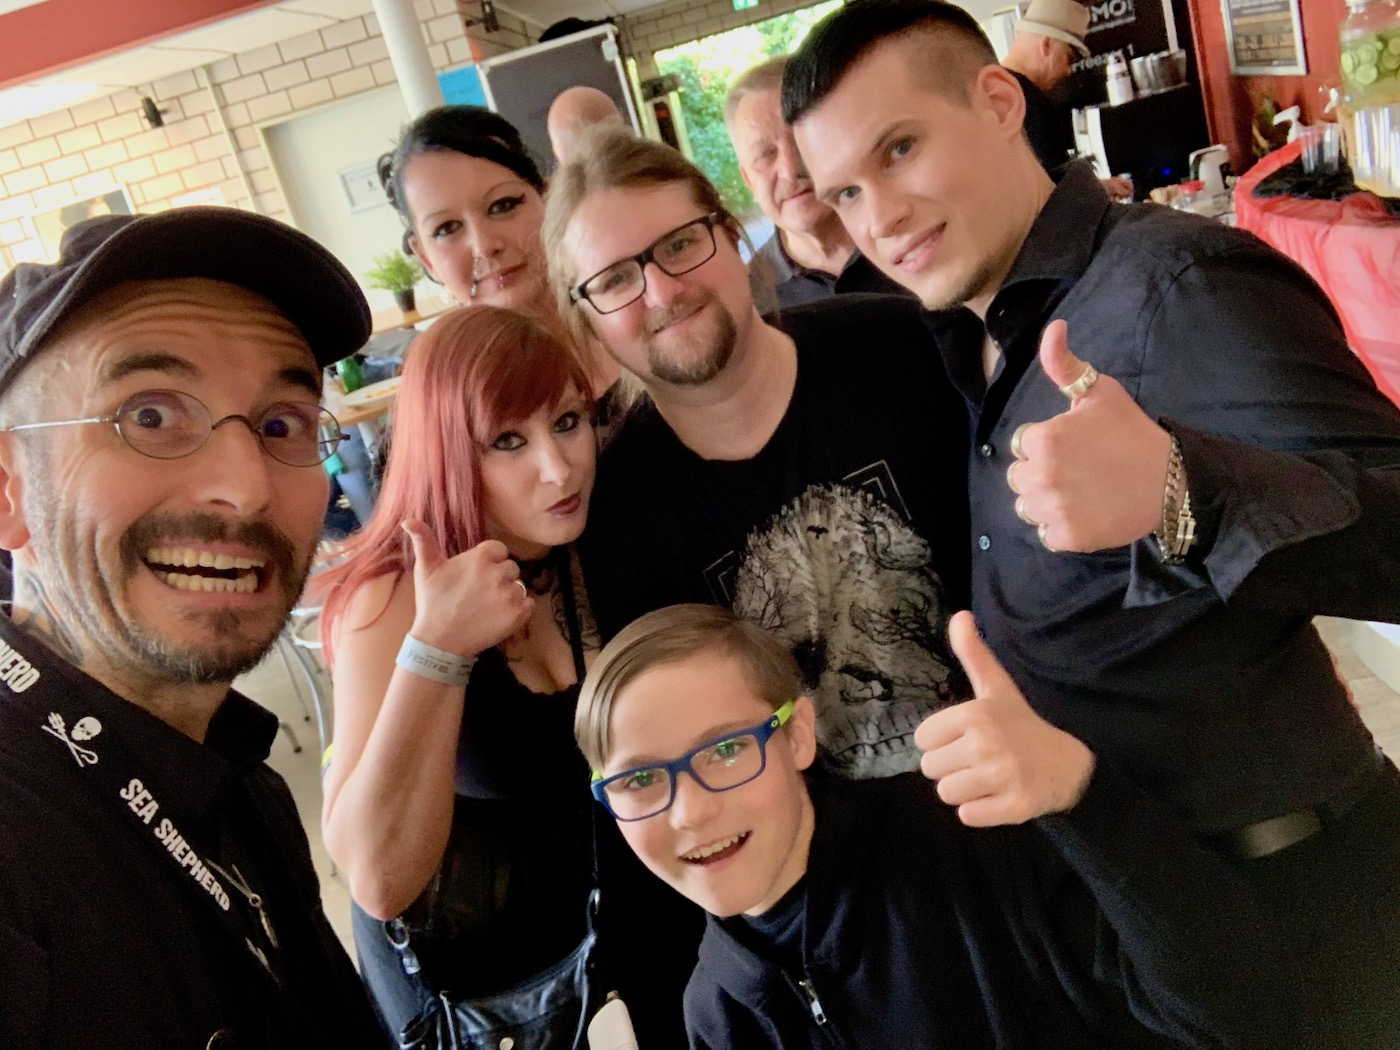 mark_benecke_amphi_festival_koeln_2019 - 1.jpg